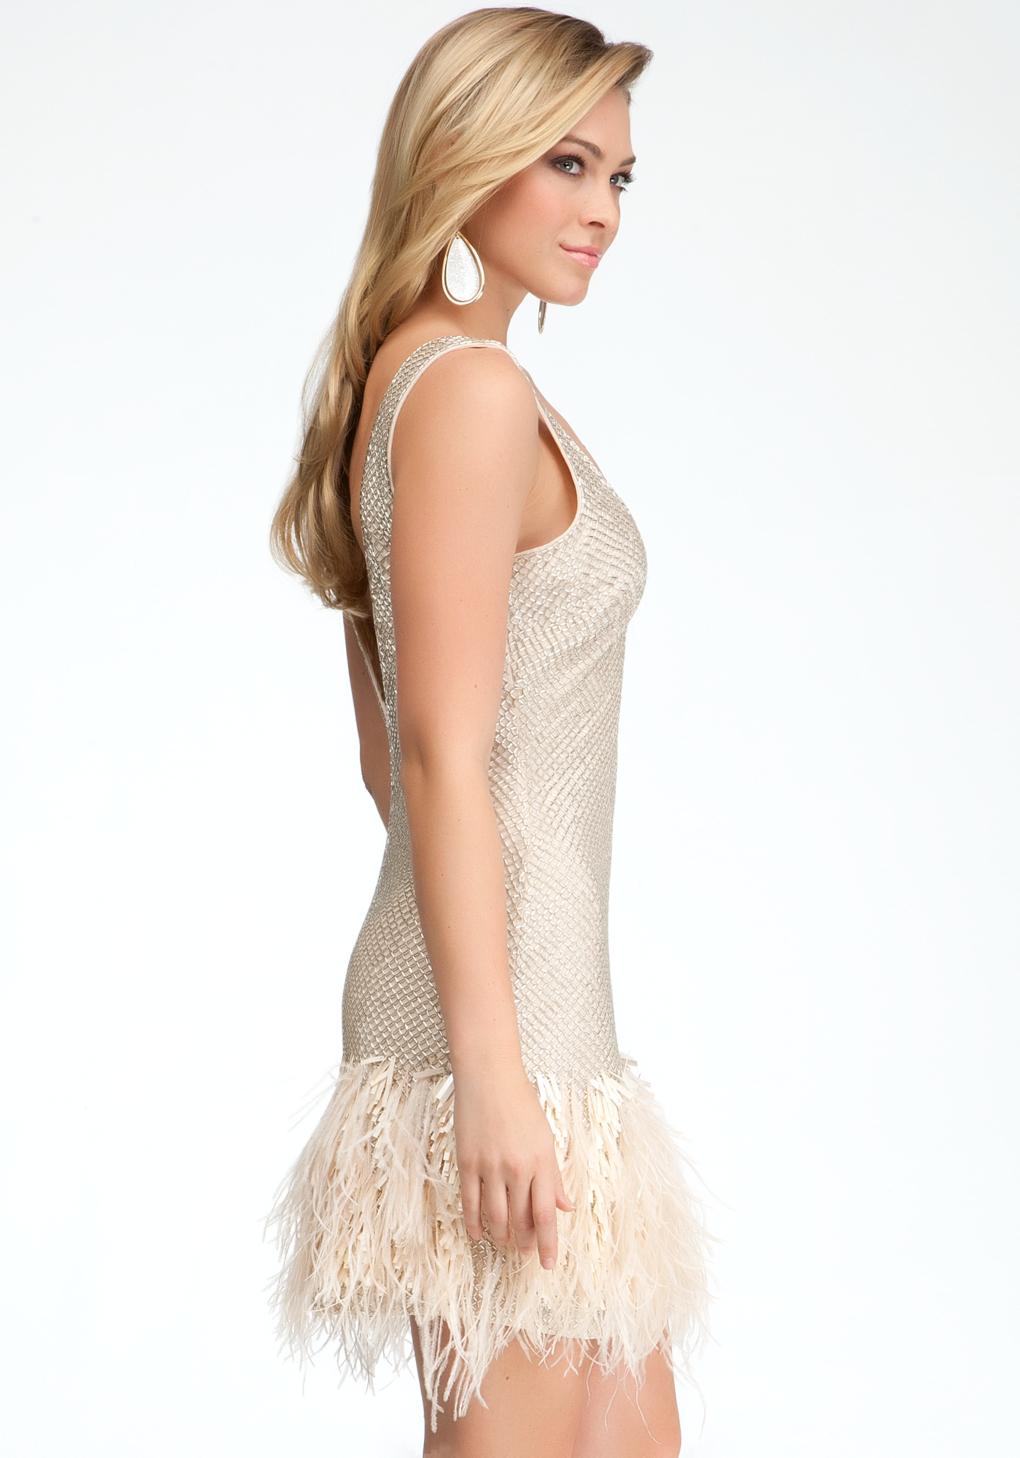 Bebe Feather Trim Sequin Studded Dress Bebeblack In